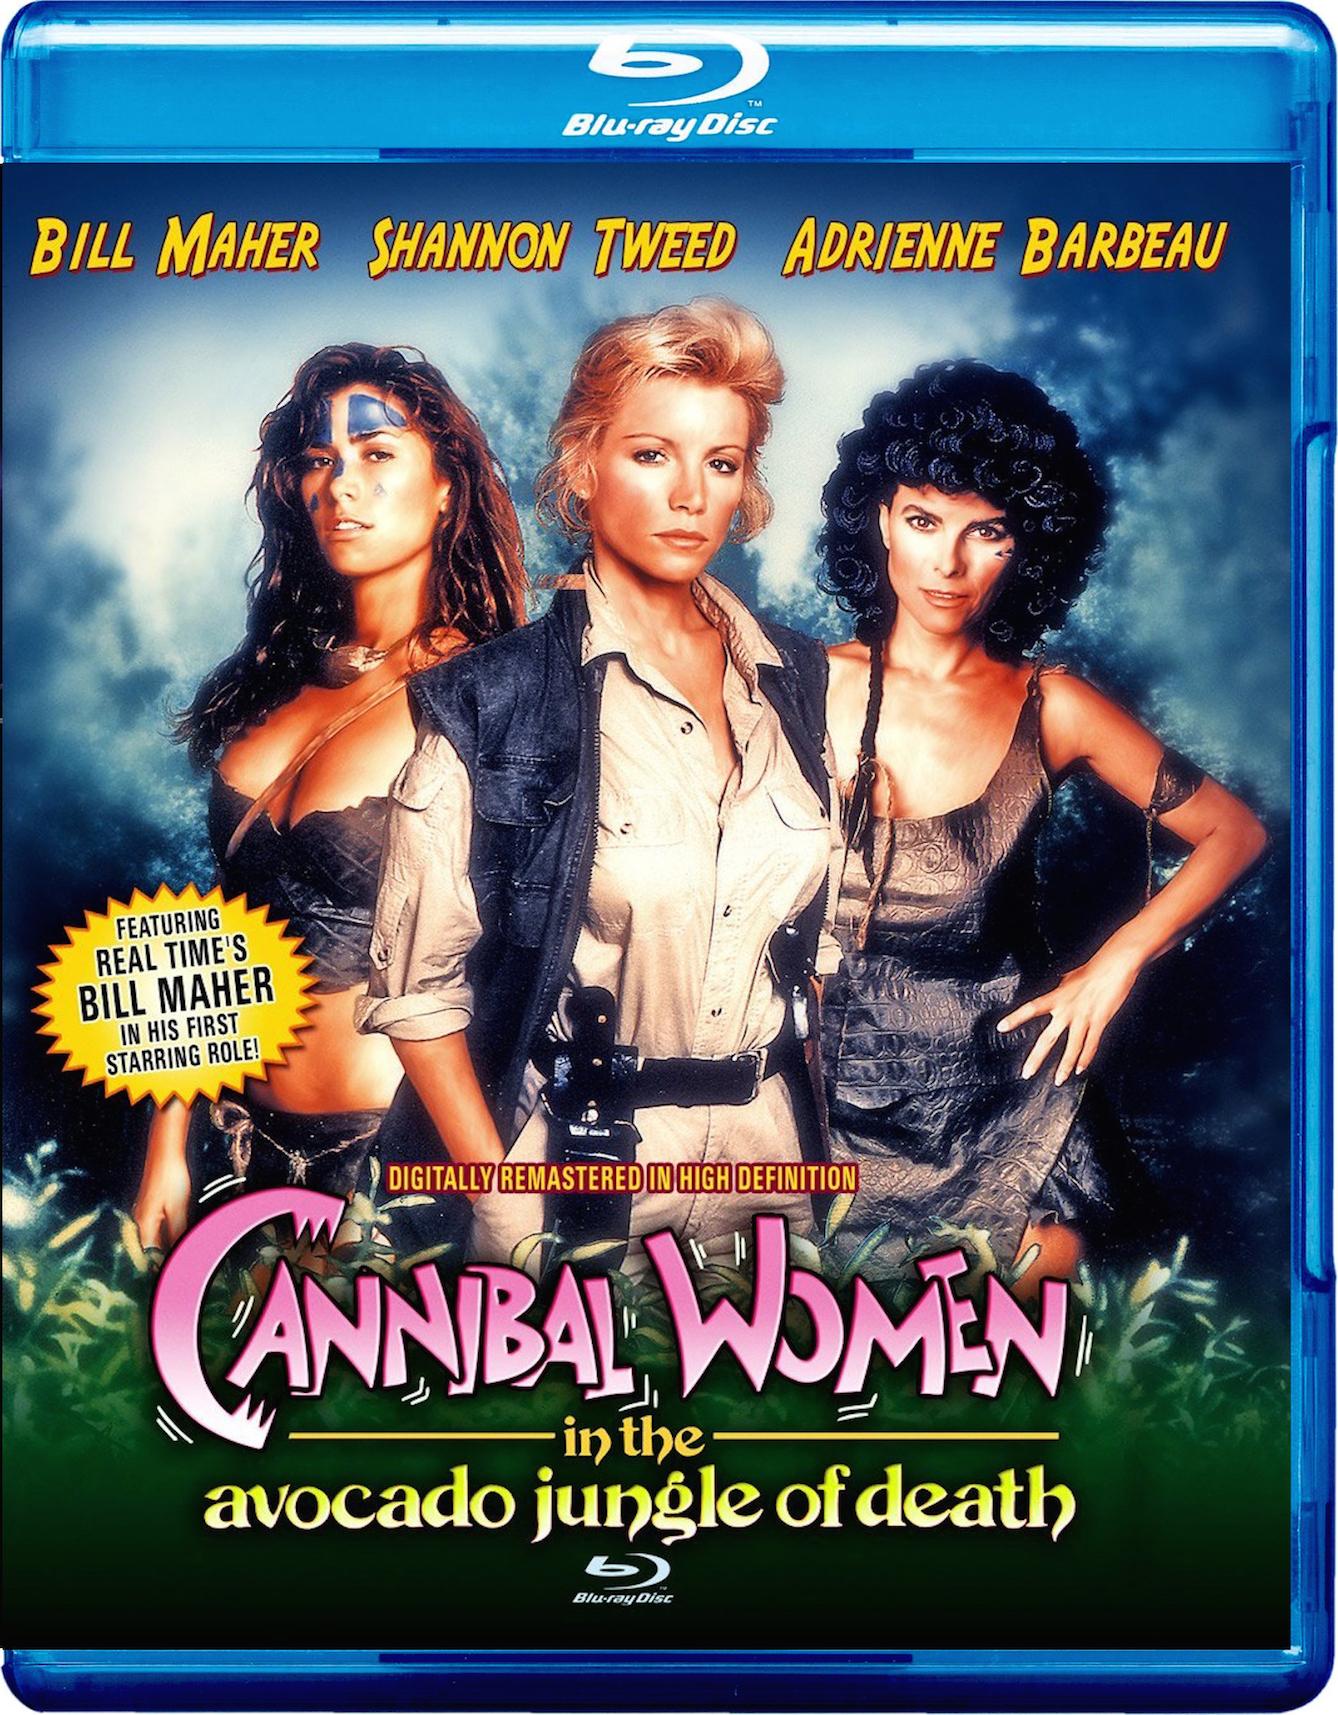 Erotic jungle cannibal caught women